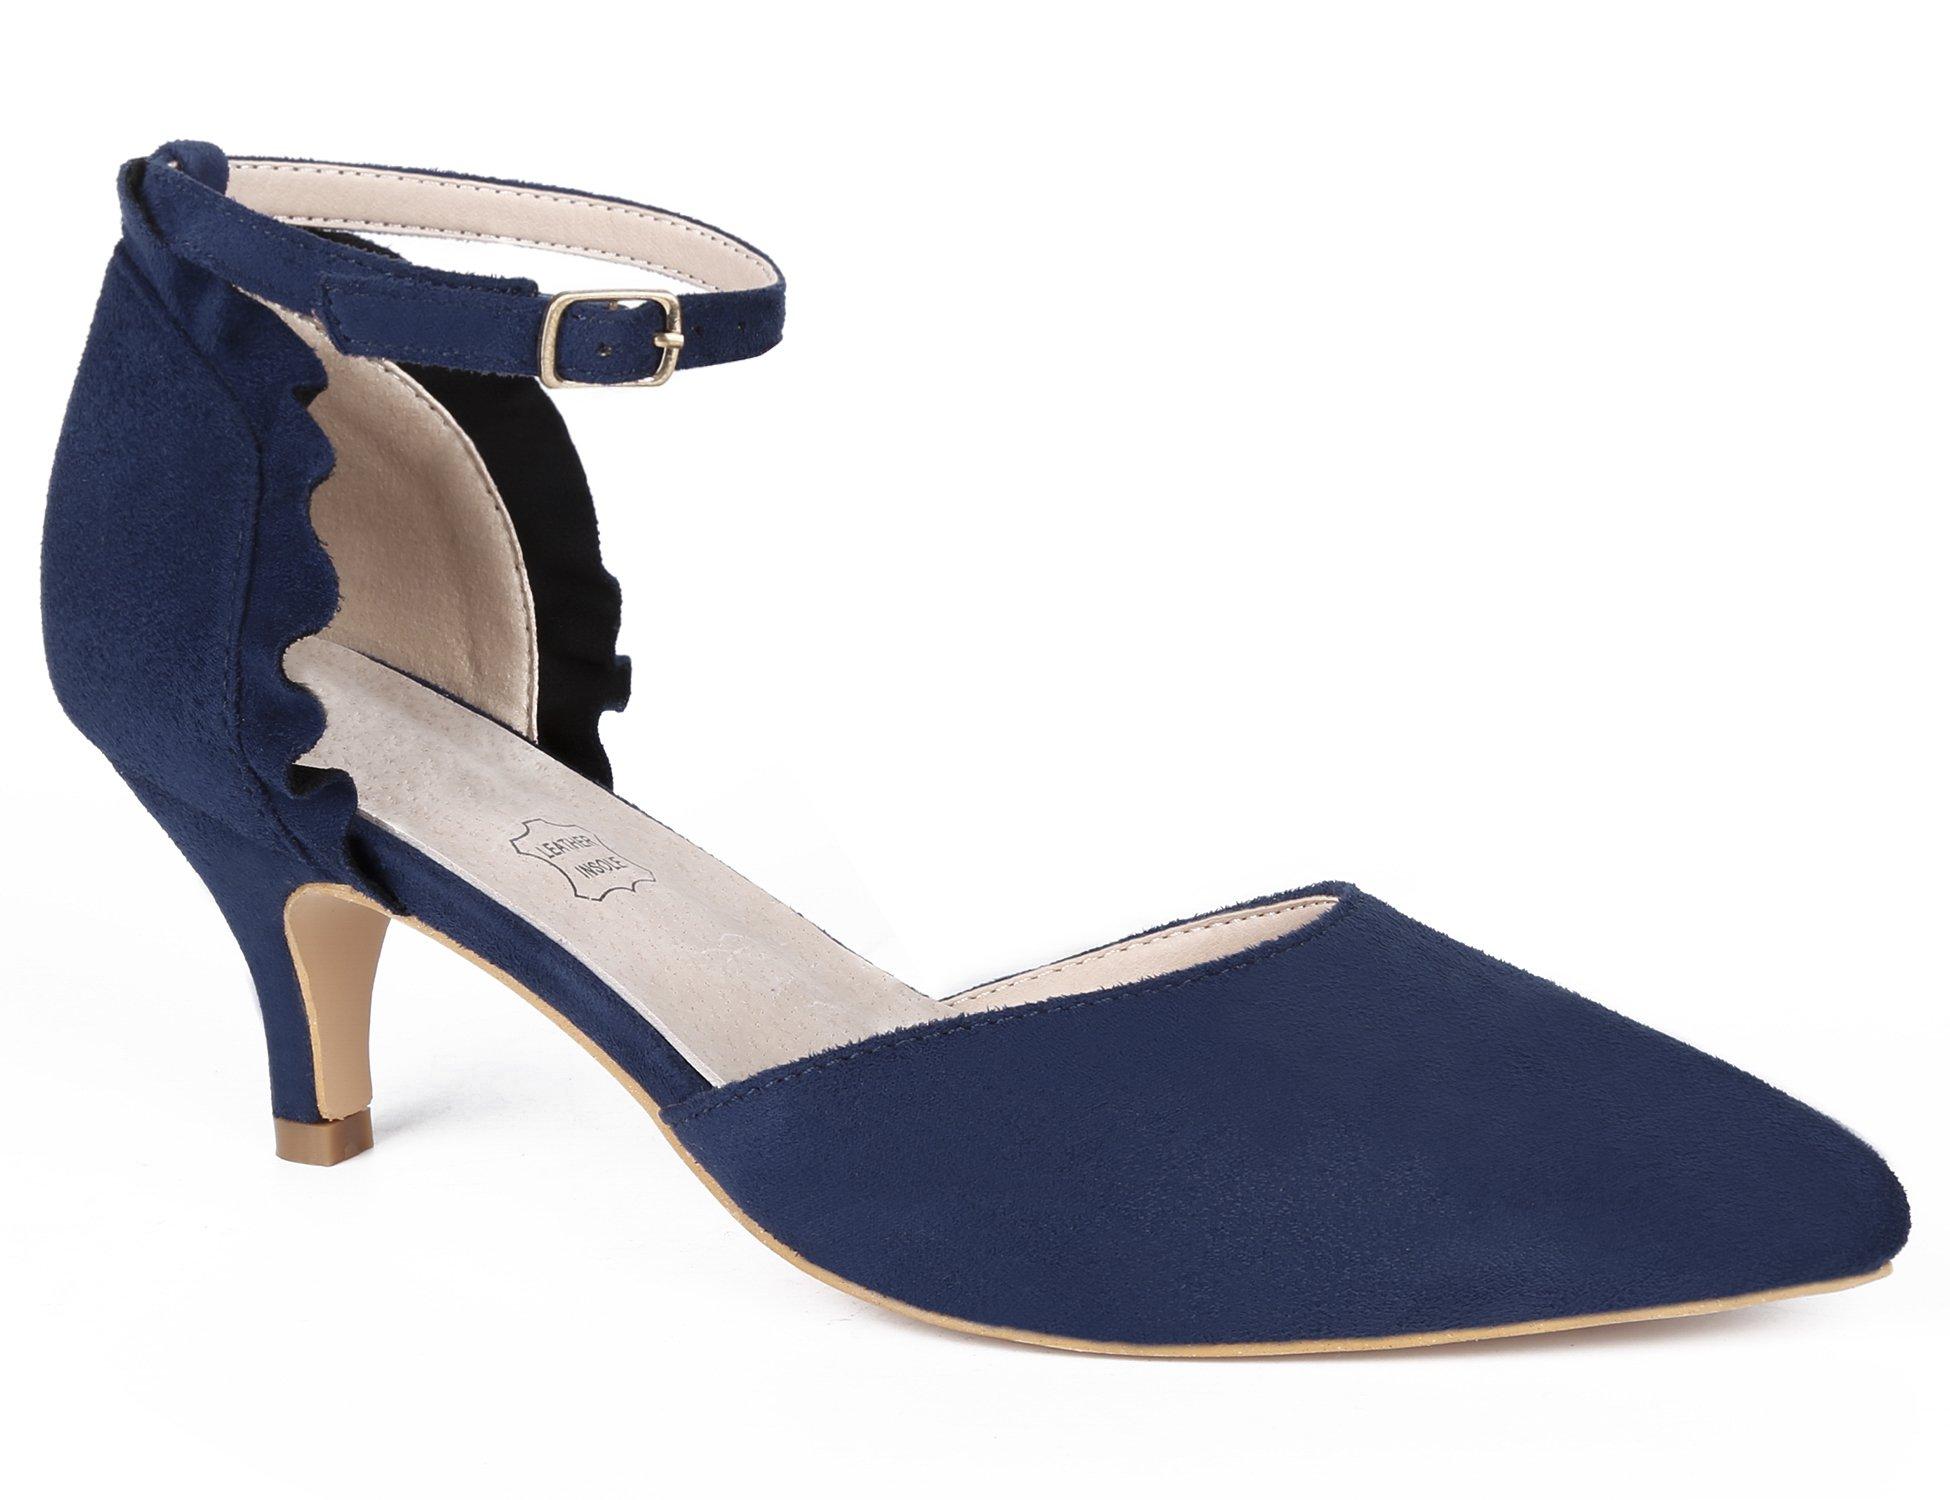 MaxMuxun Women Shoes Sexy Closed Toe Kitten Heels Blue Comfortable Slingback Dress Pumps Size 7